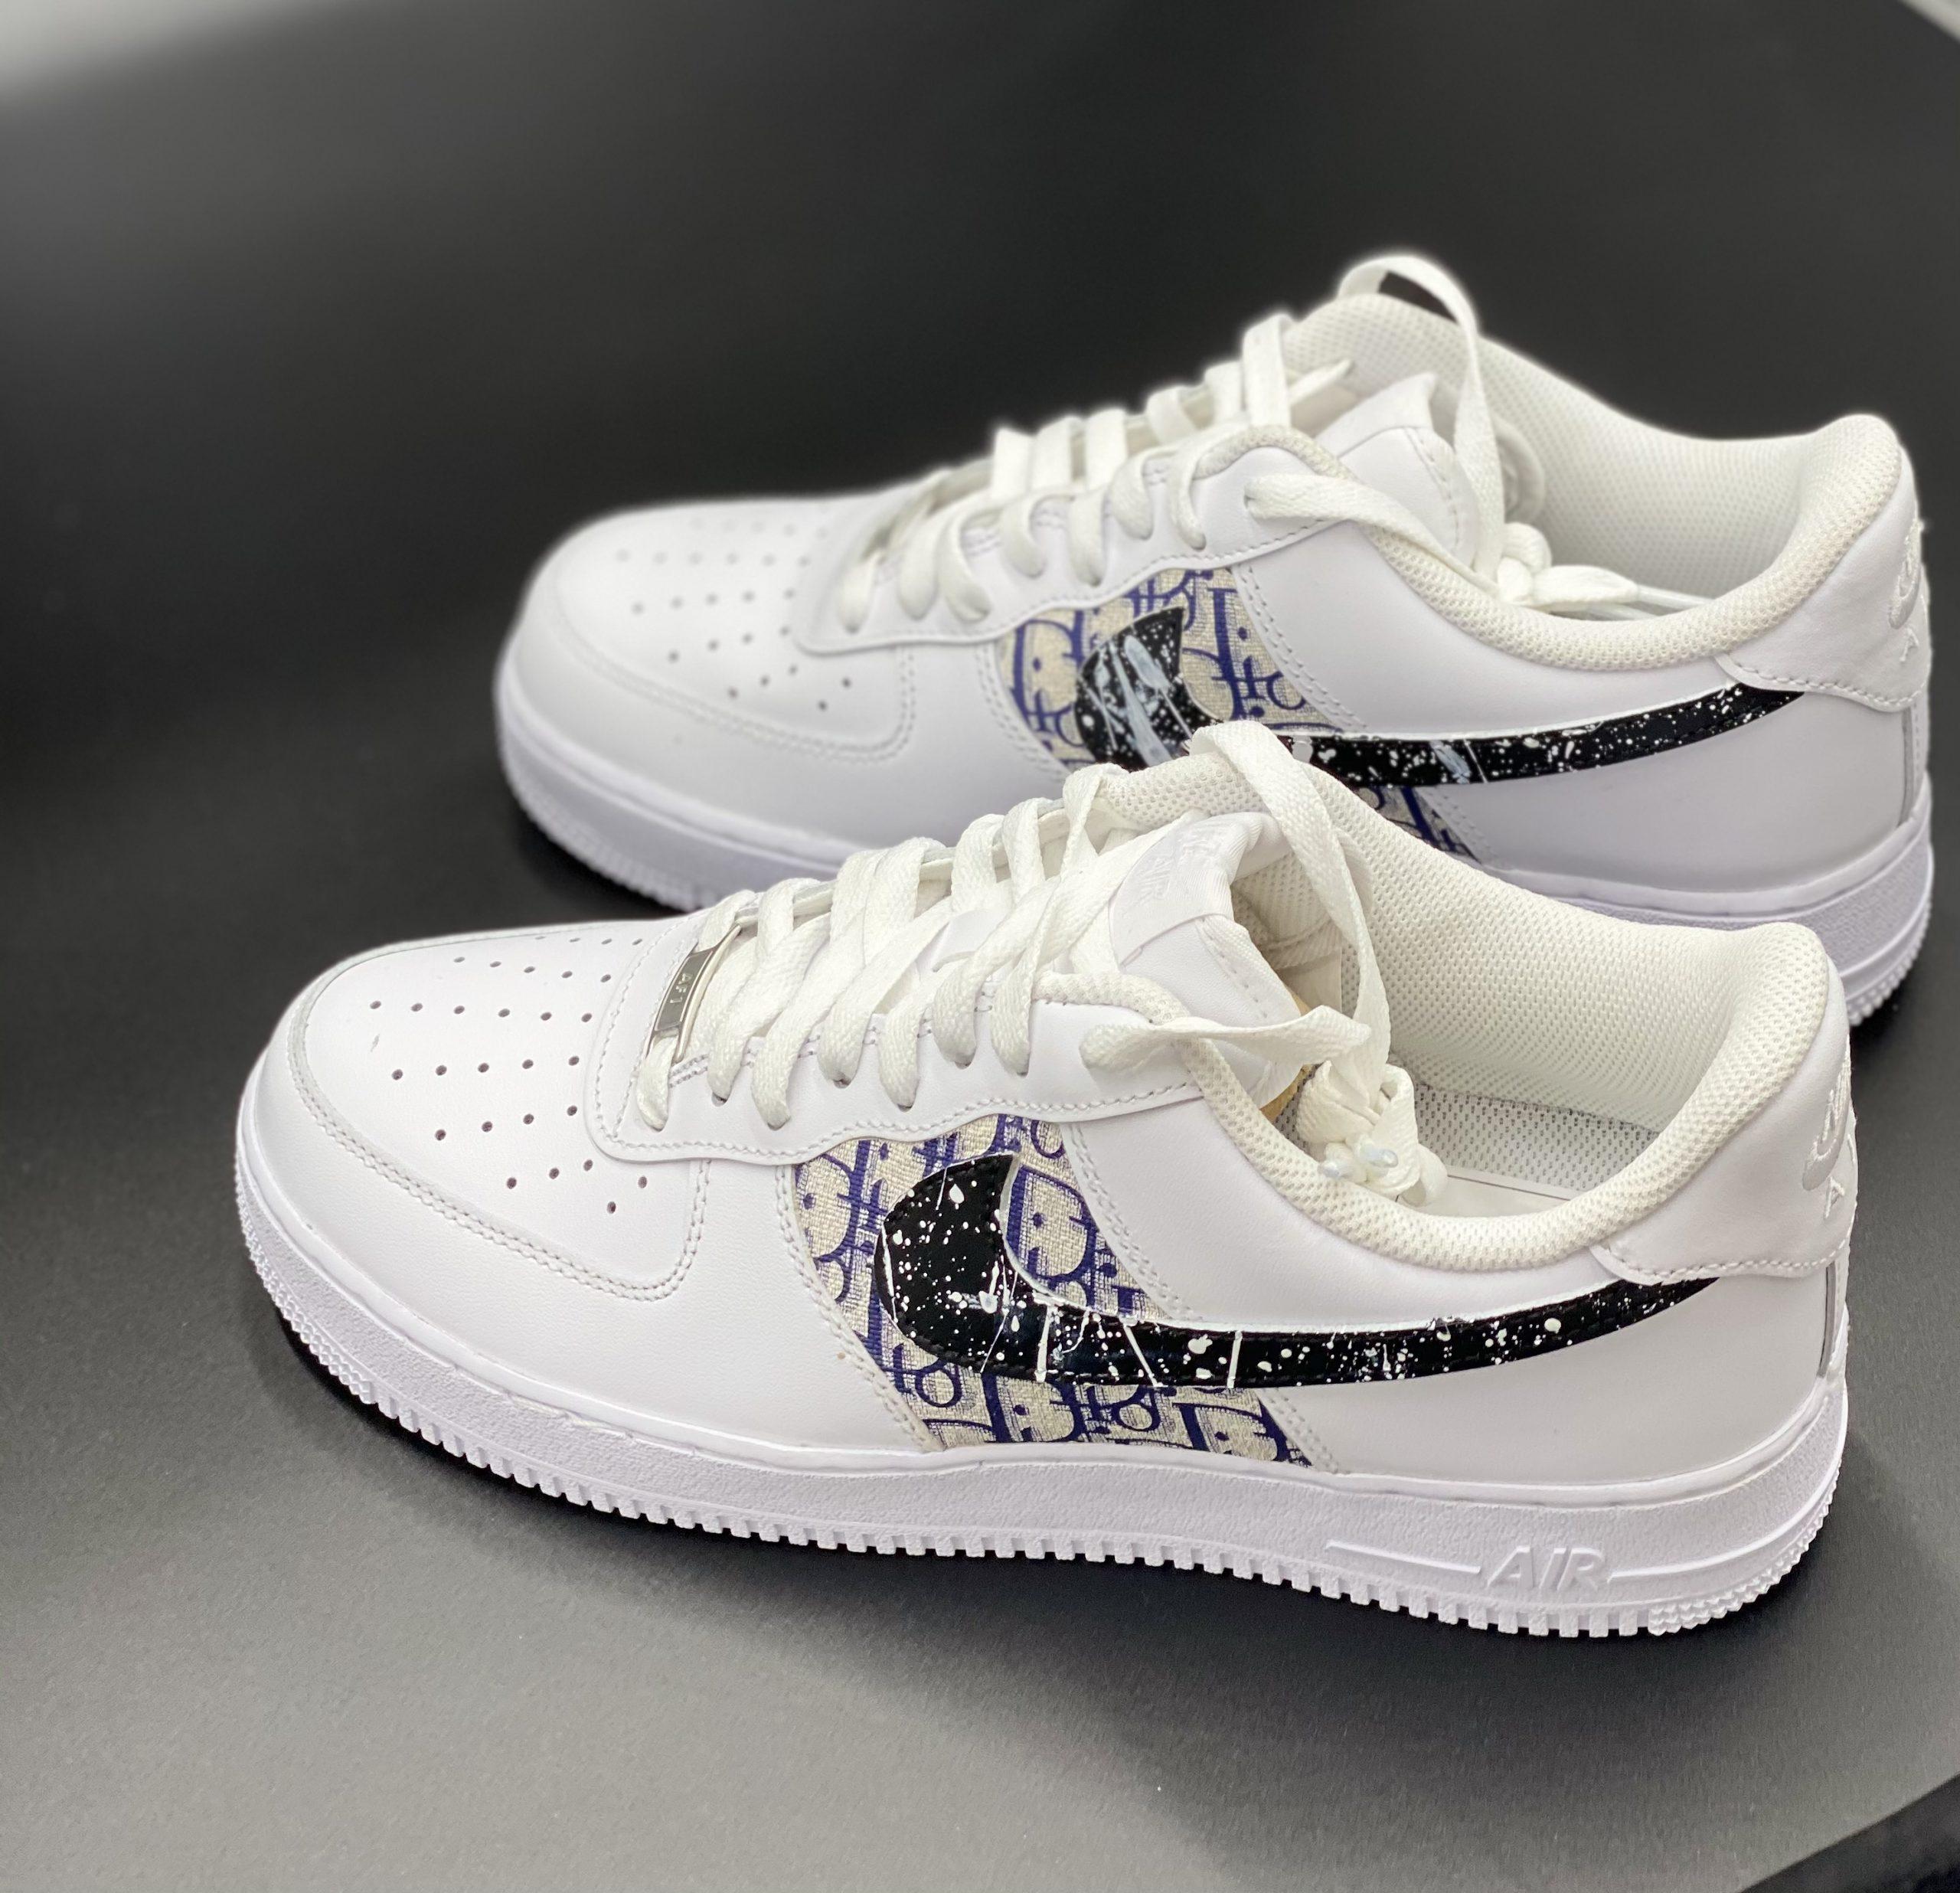 Nike air force x Marinenblau Dio x speziall swoosh   Kauf günstig